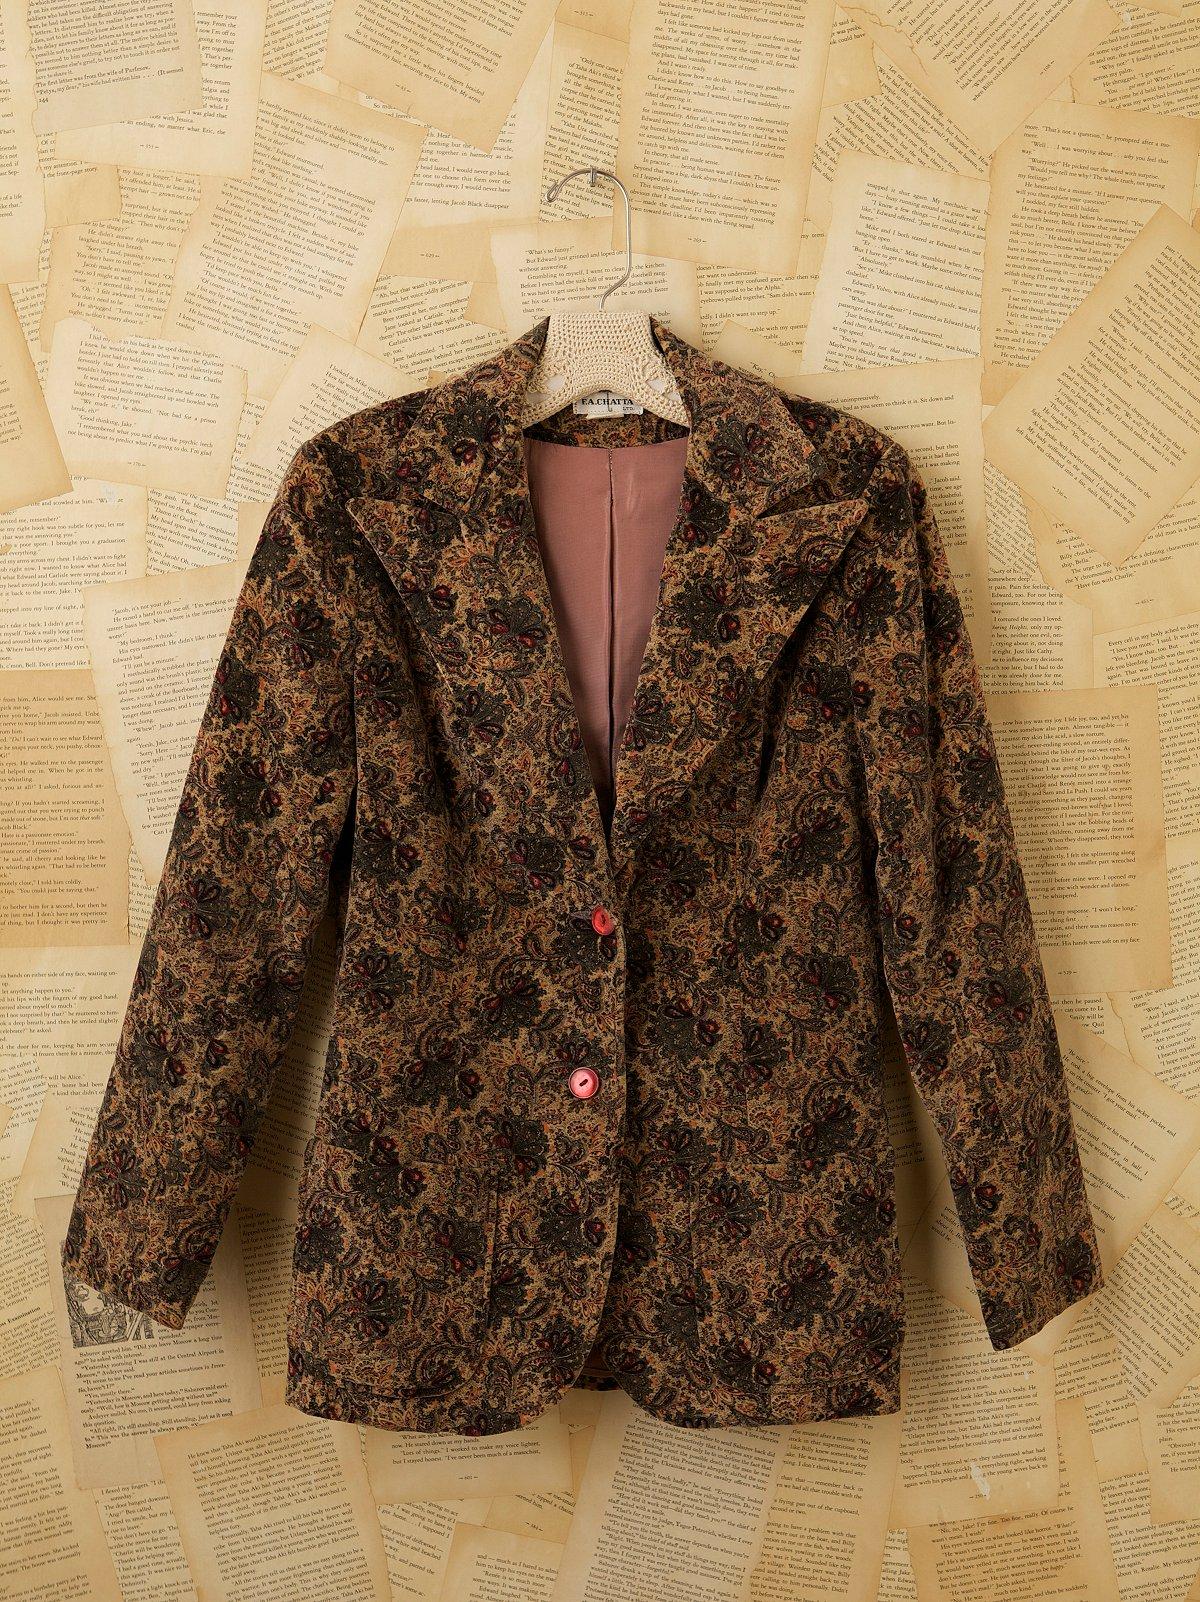 Vintage 1970s Cotton Paisley Jacket